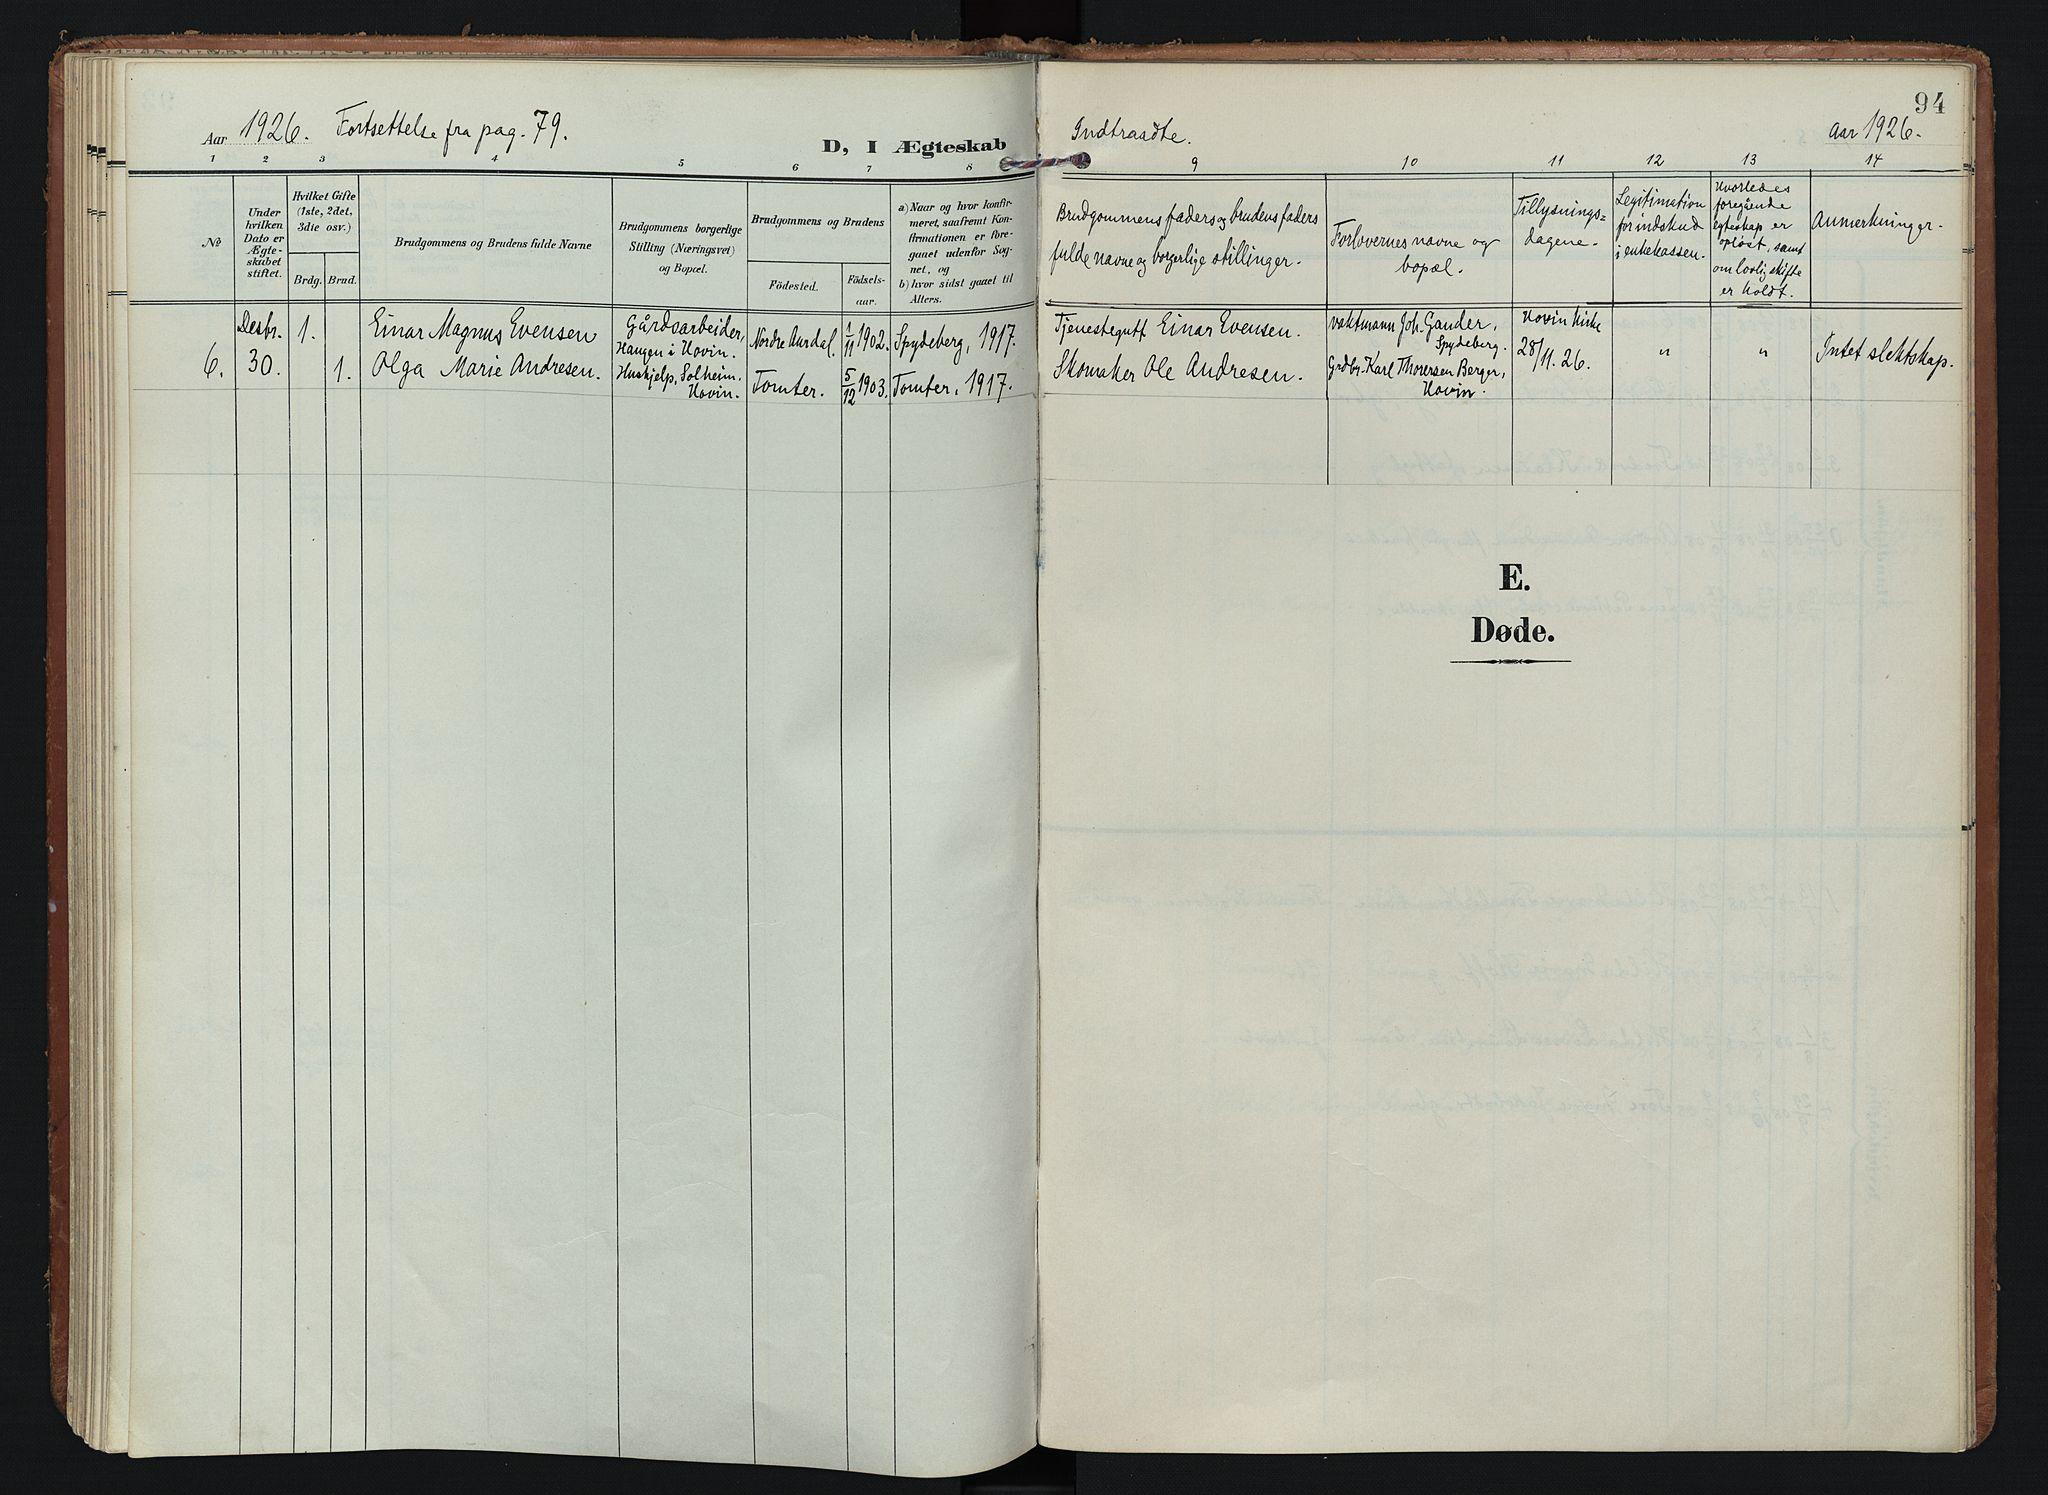 SAO, Spydeberg prestekontor Kirkebøker, F/Fb/L0002: Ministerialbok nr. II 2, 1908-1926, s. 94